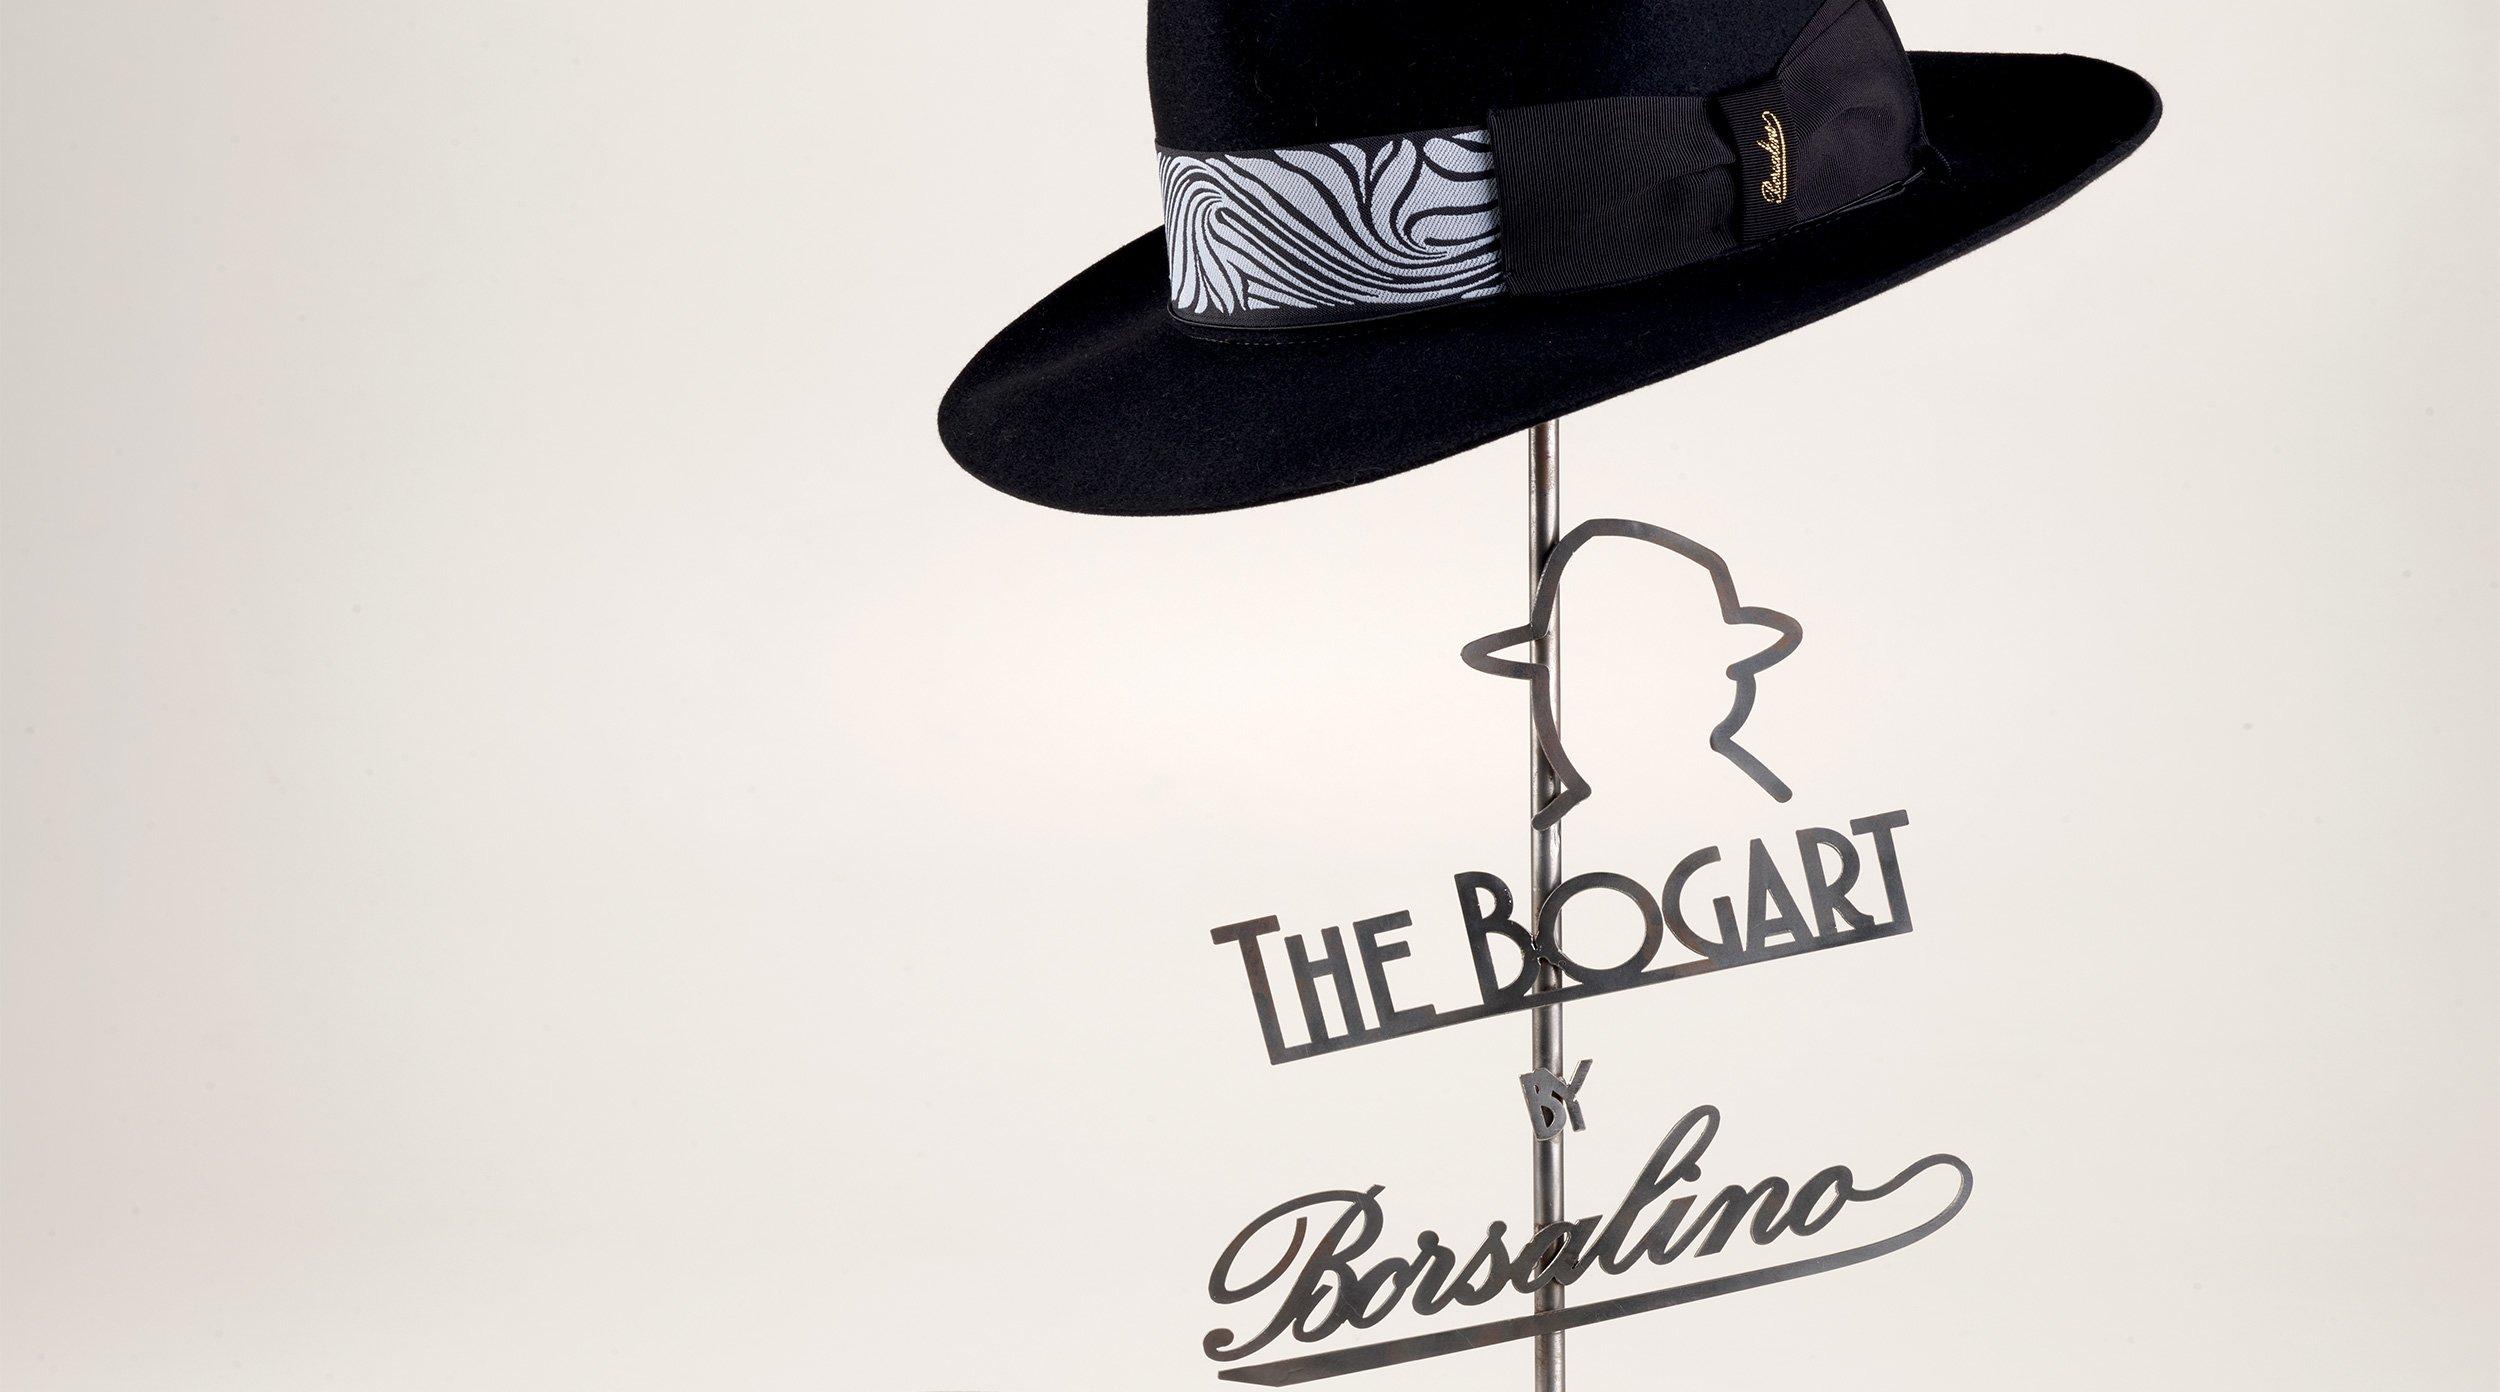 THE BOGART BY BORSALINO